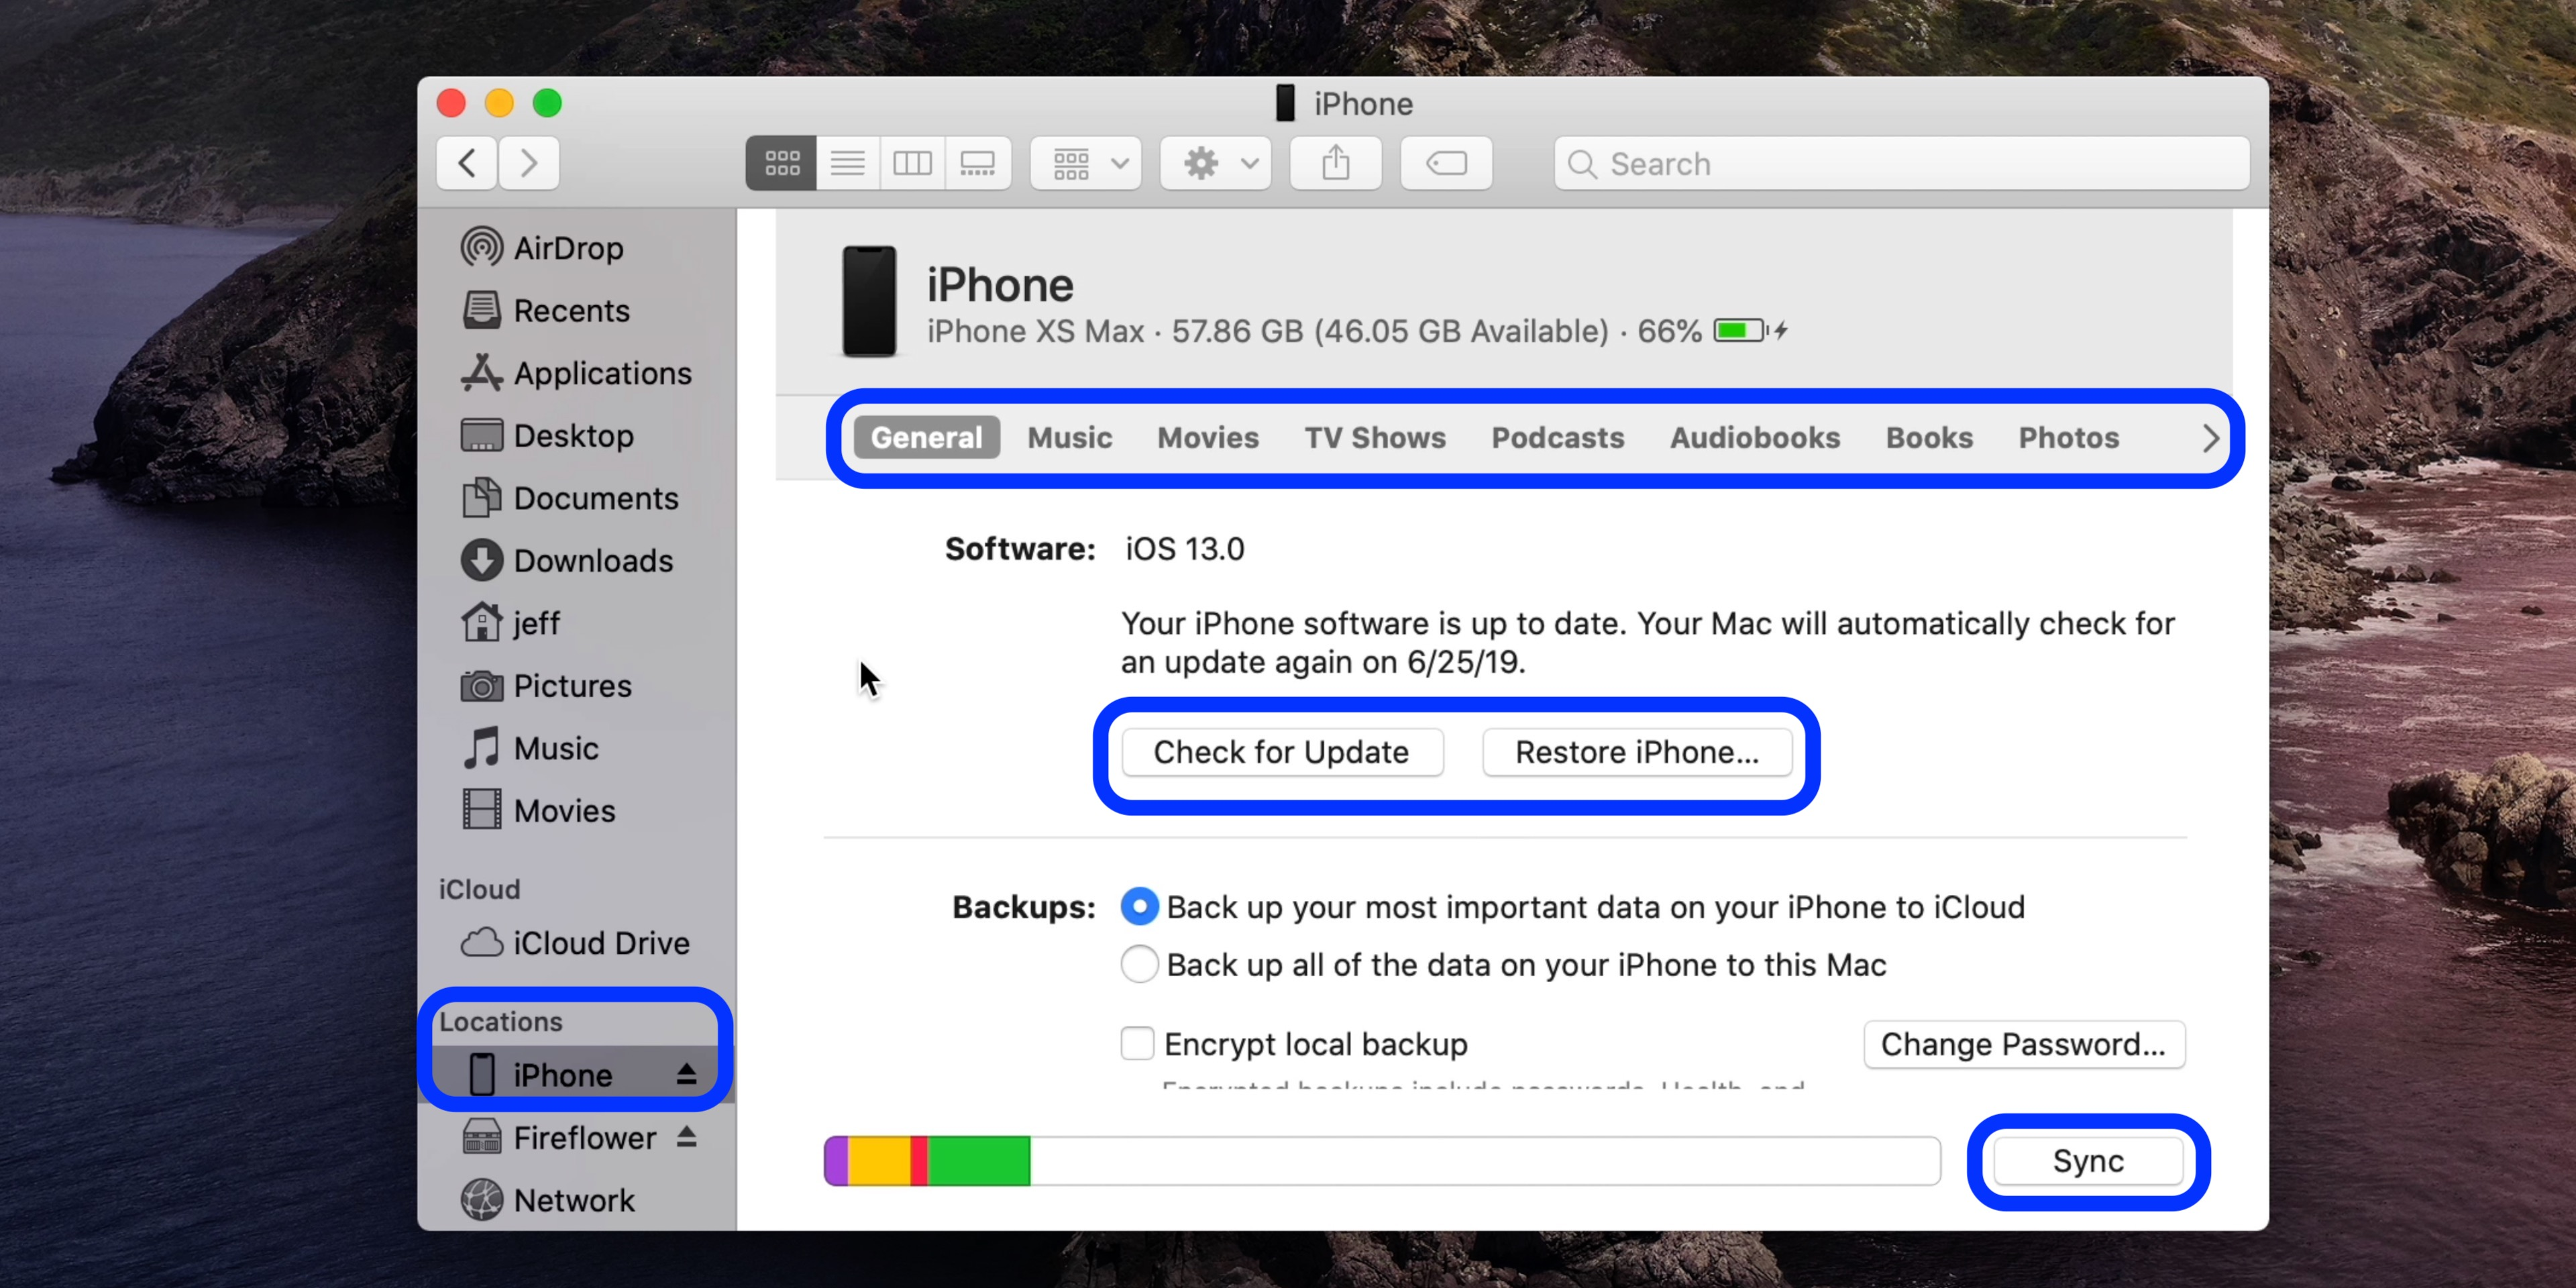 How to sync iPhone iPad Mac macOS Catalina